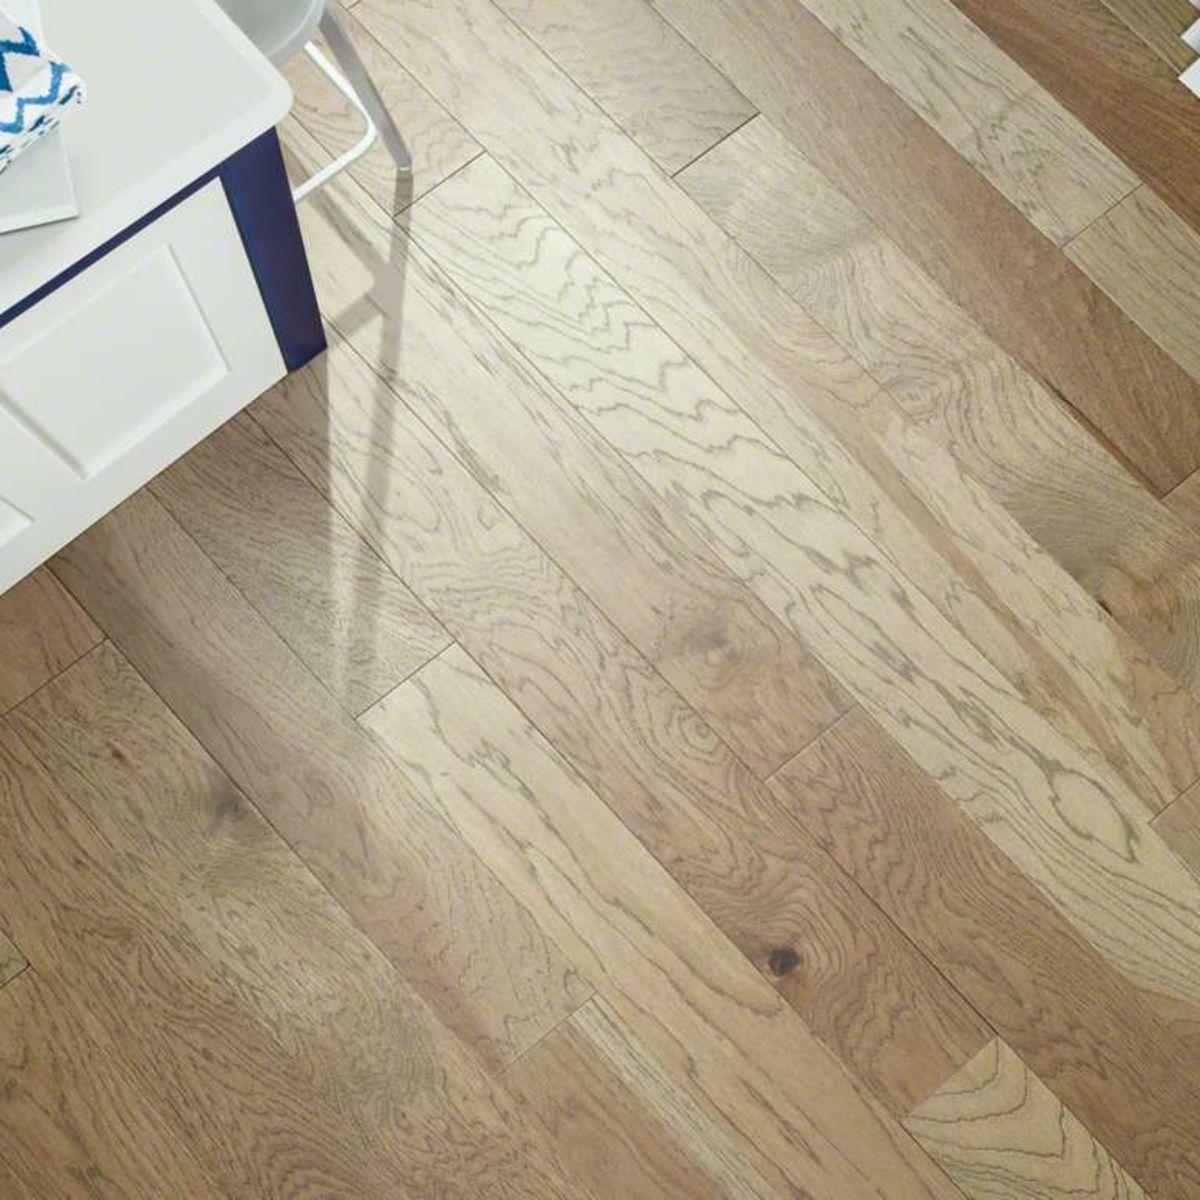 Northington Smooth Hardwood flooring | Budget Flooring, Inc.